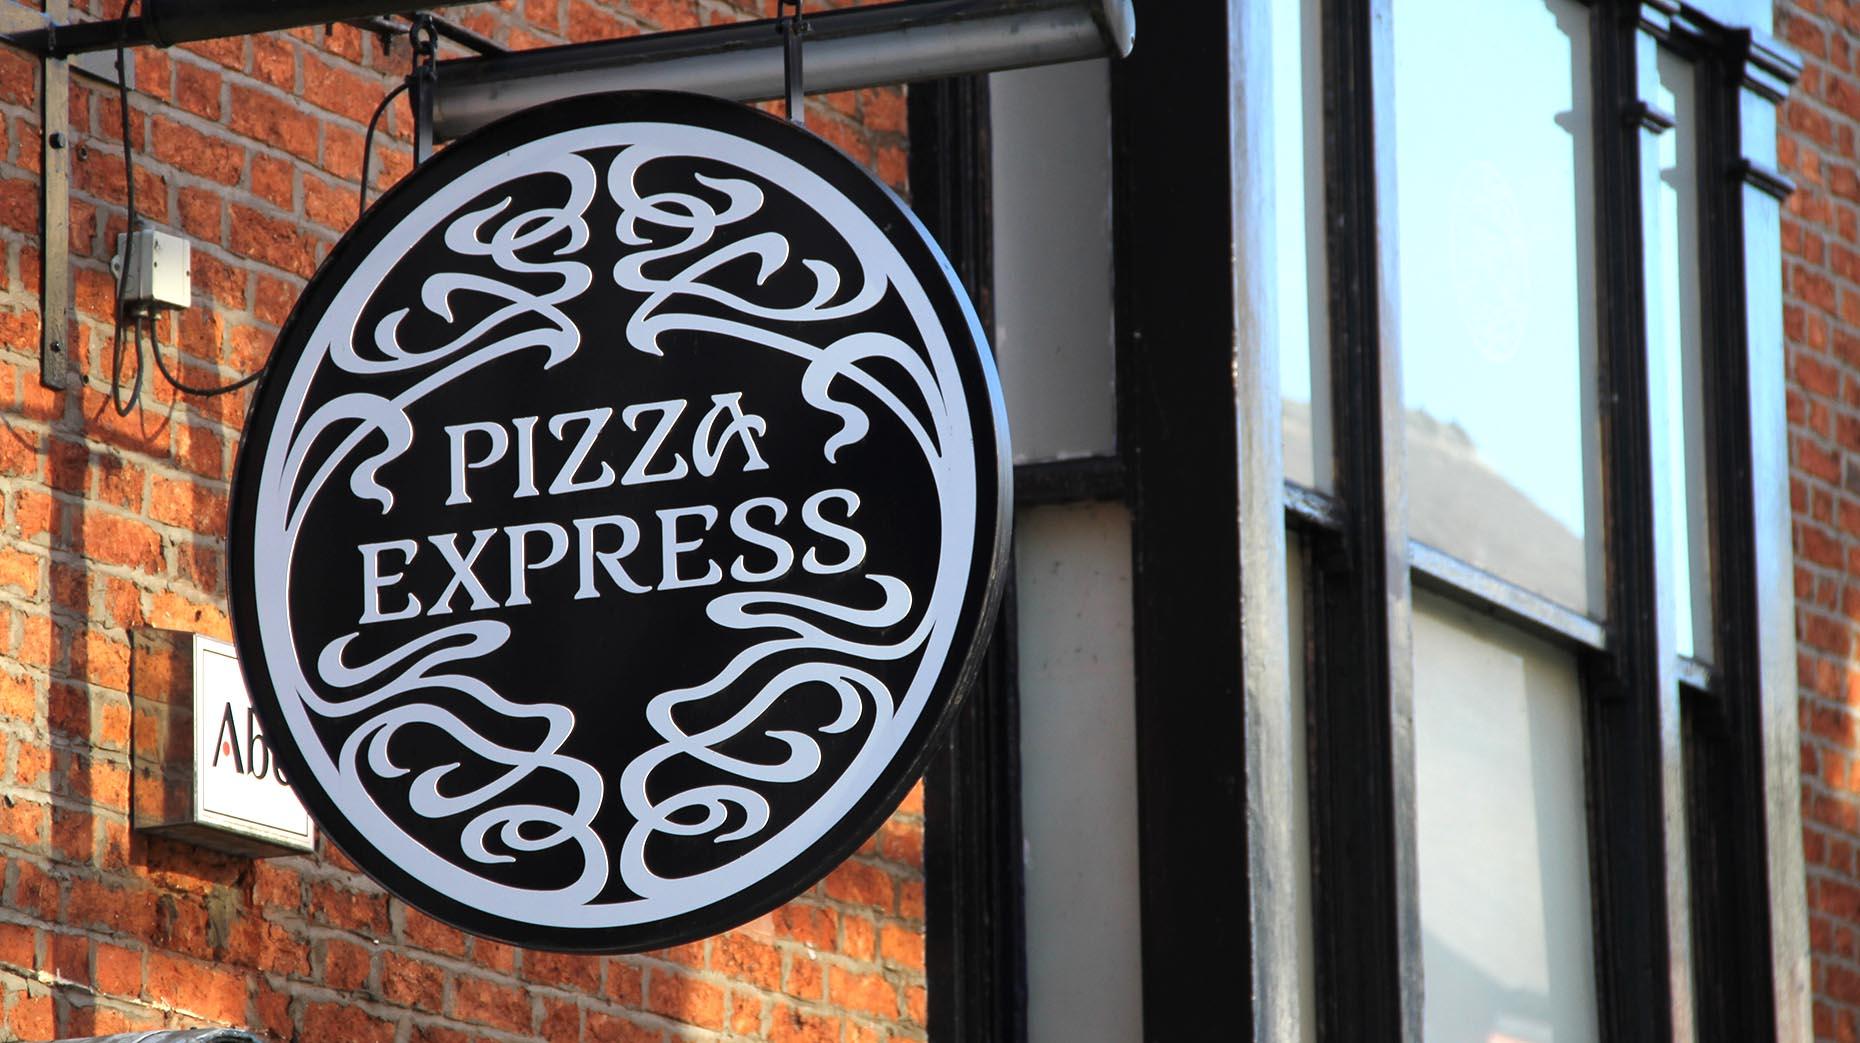 Lincoln Pizza Express pregnancy discrimination case ends